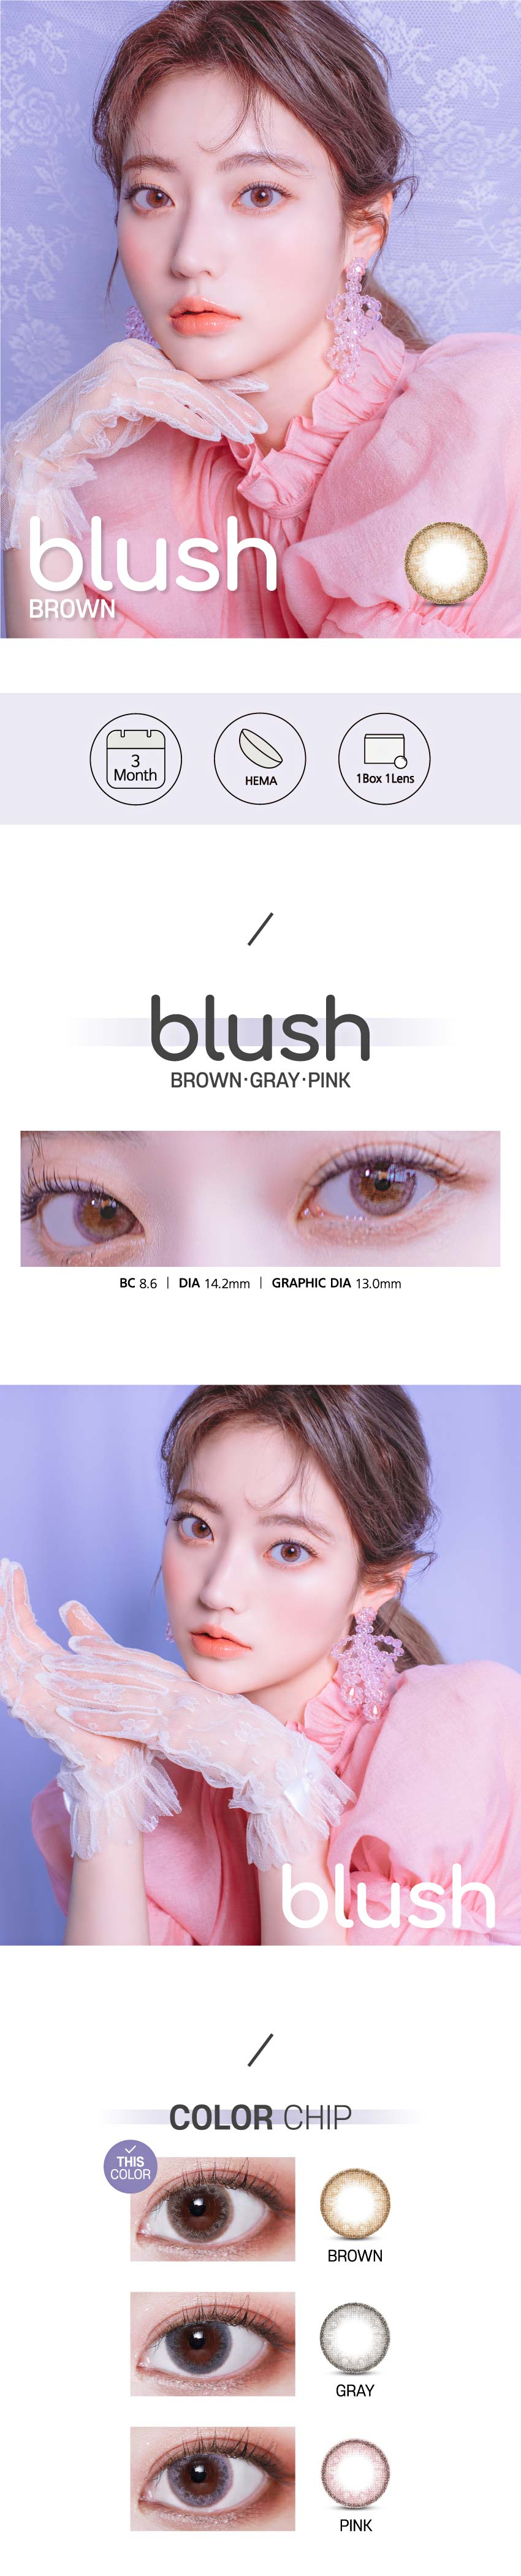 blush-brown-korean-circle-lenses1.jpg